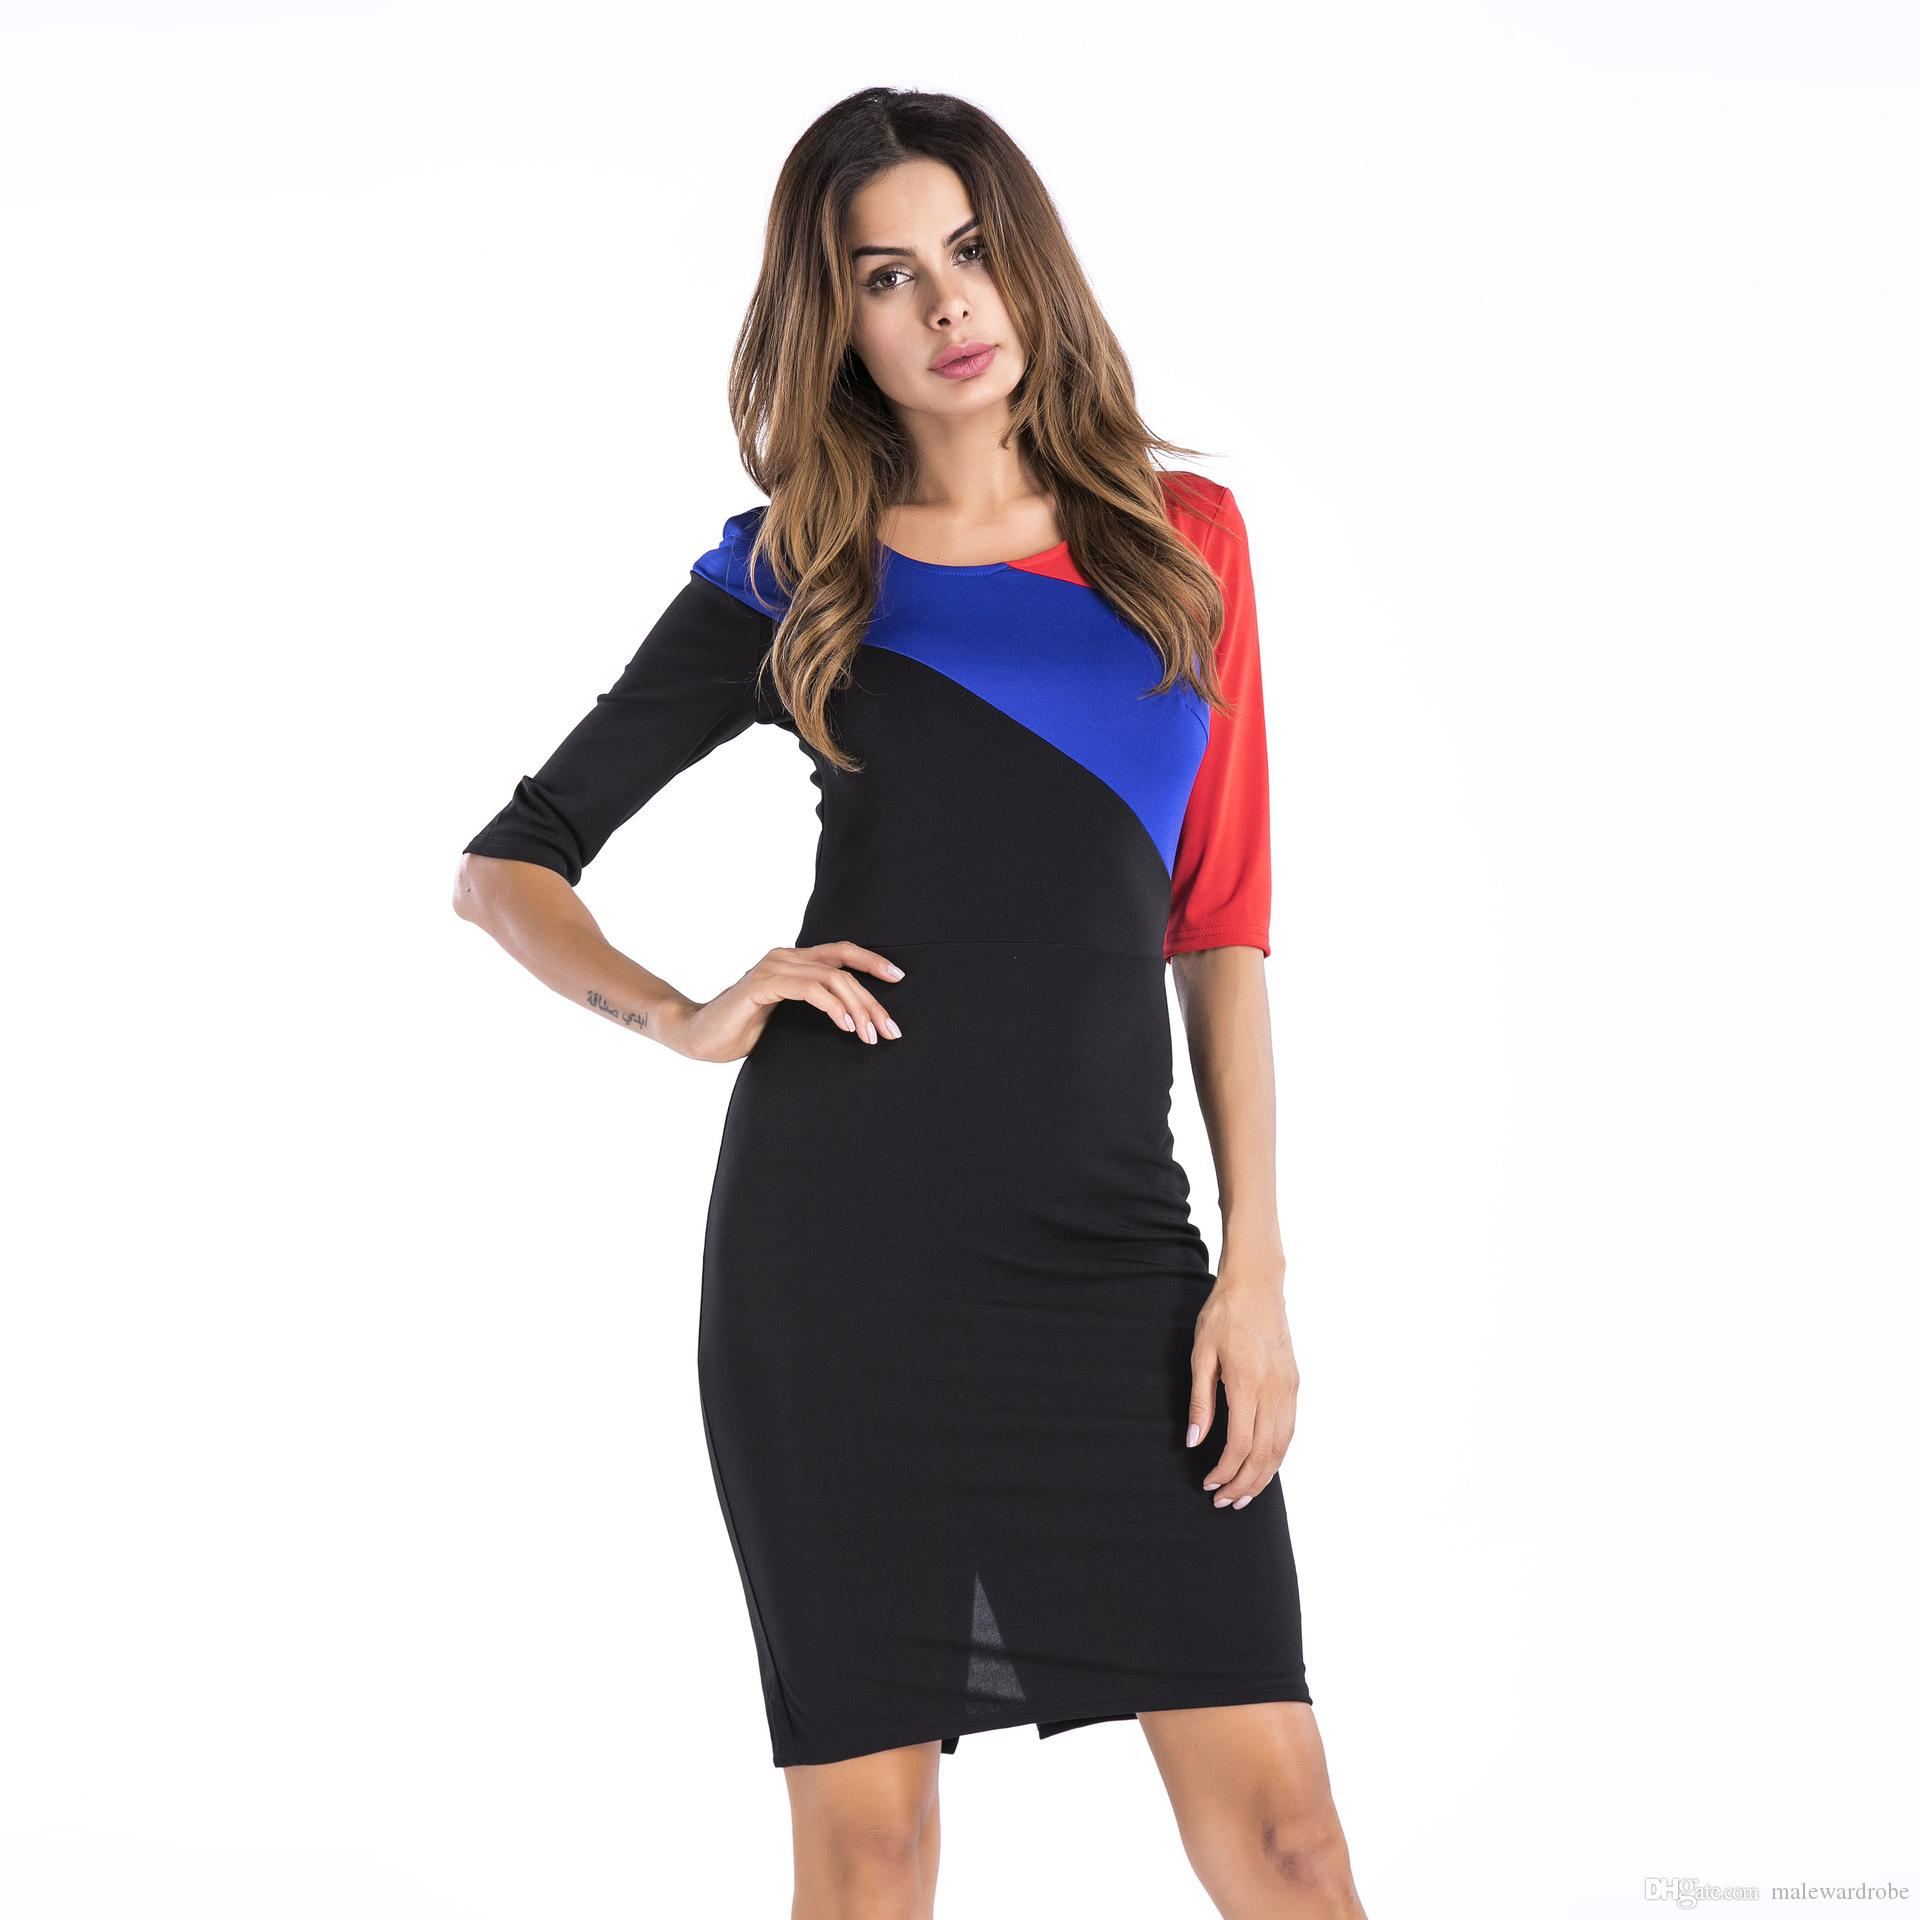 f4e1c302243783 2019 Summer New Women Clothes Dress Colors Contrast Slim Fit Pencil Dresses  Formal Elegant Dressing From Malewardrobe